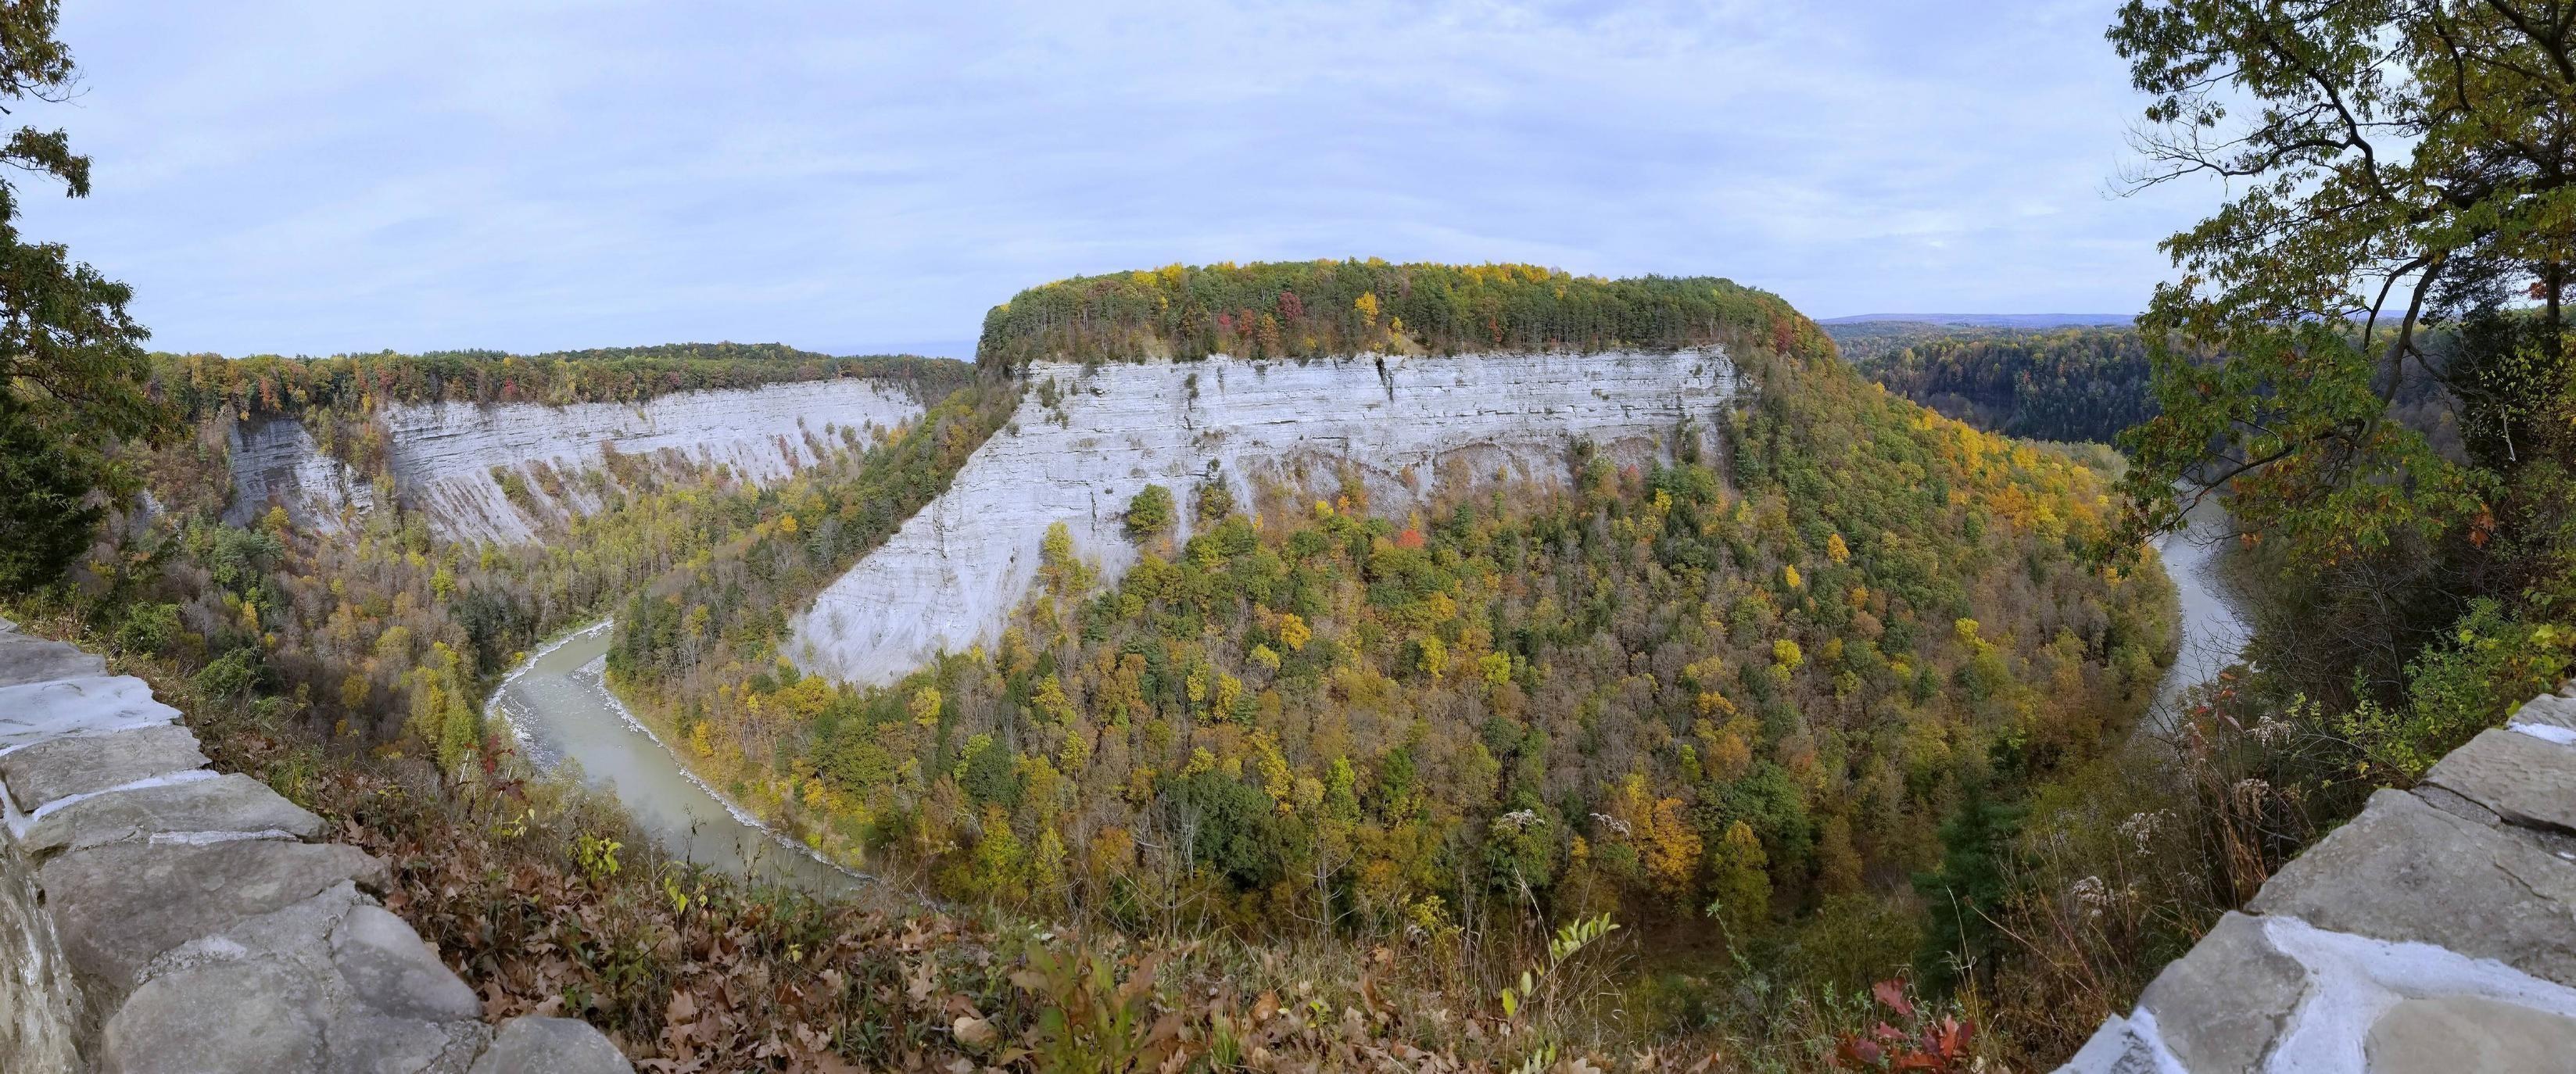 Letchworth State Park NY [OC](5492 x 2290) #letchworthstatepark Letchworth State Park NY [OC](5492 x 2290) #letchworthstatepark Letchworth State Park NY [OC](5492 x 2290) #letchworthstatepark Letchworth State Park NY [OC](5492 x 2290) #letchworthstatepark Letchworth State Park NY [OC](5492 x 2290) #letchworthstatepark Letchworth State Park NY [OC](5492 x 2290) #letchworthstatepark Letchworth State Park NY [OC](5492 x 2290) #letchworthstatepark Letchworth State Park NY [OC](5492 x 2290) #letchworthstatepark